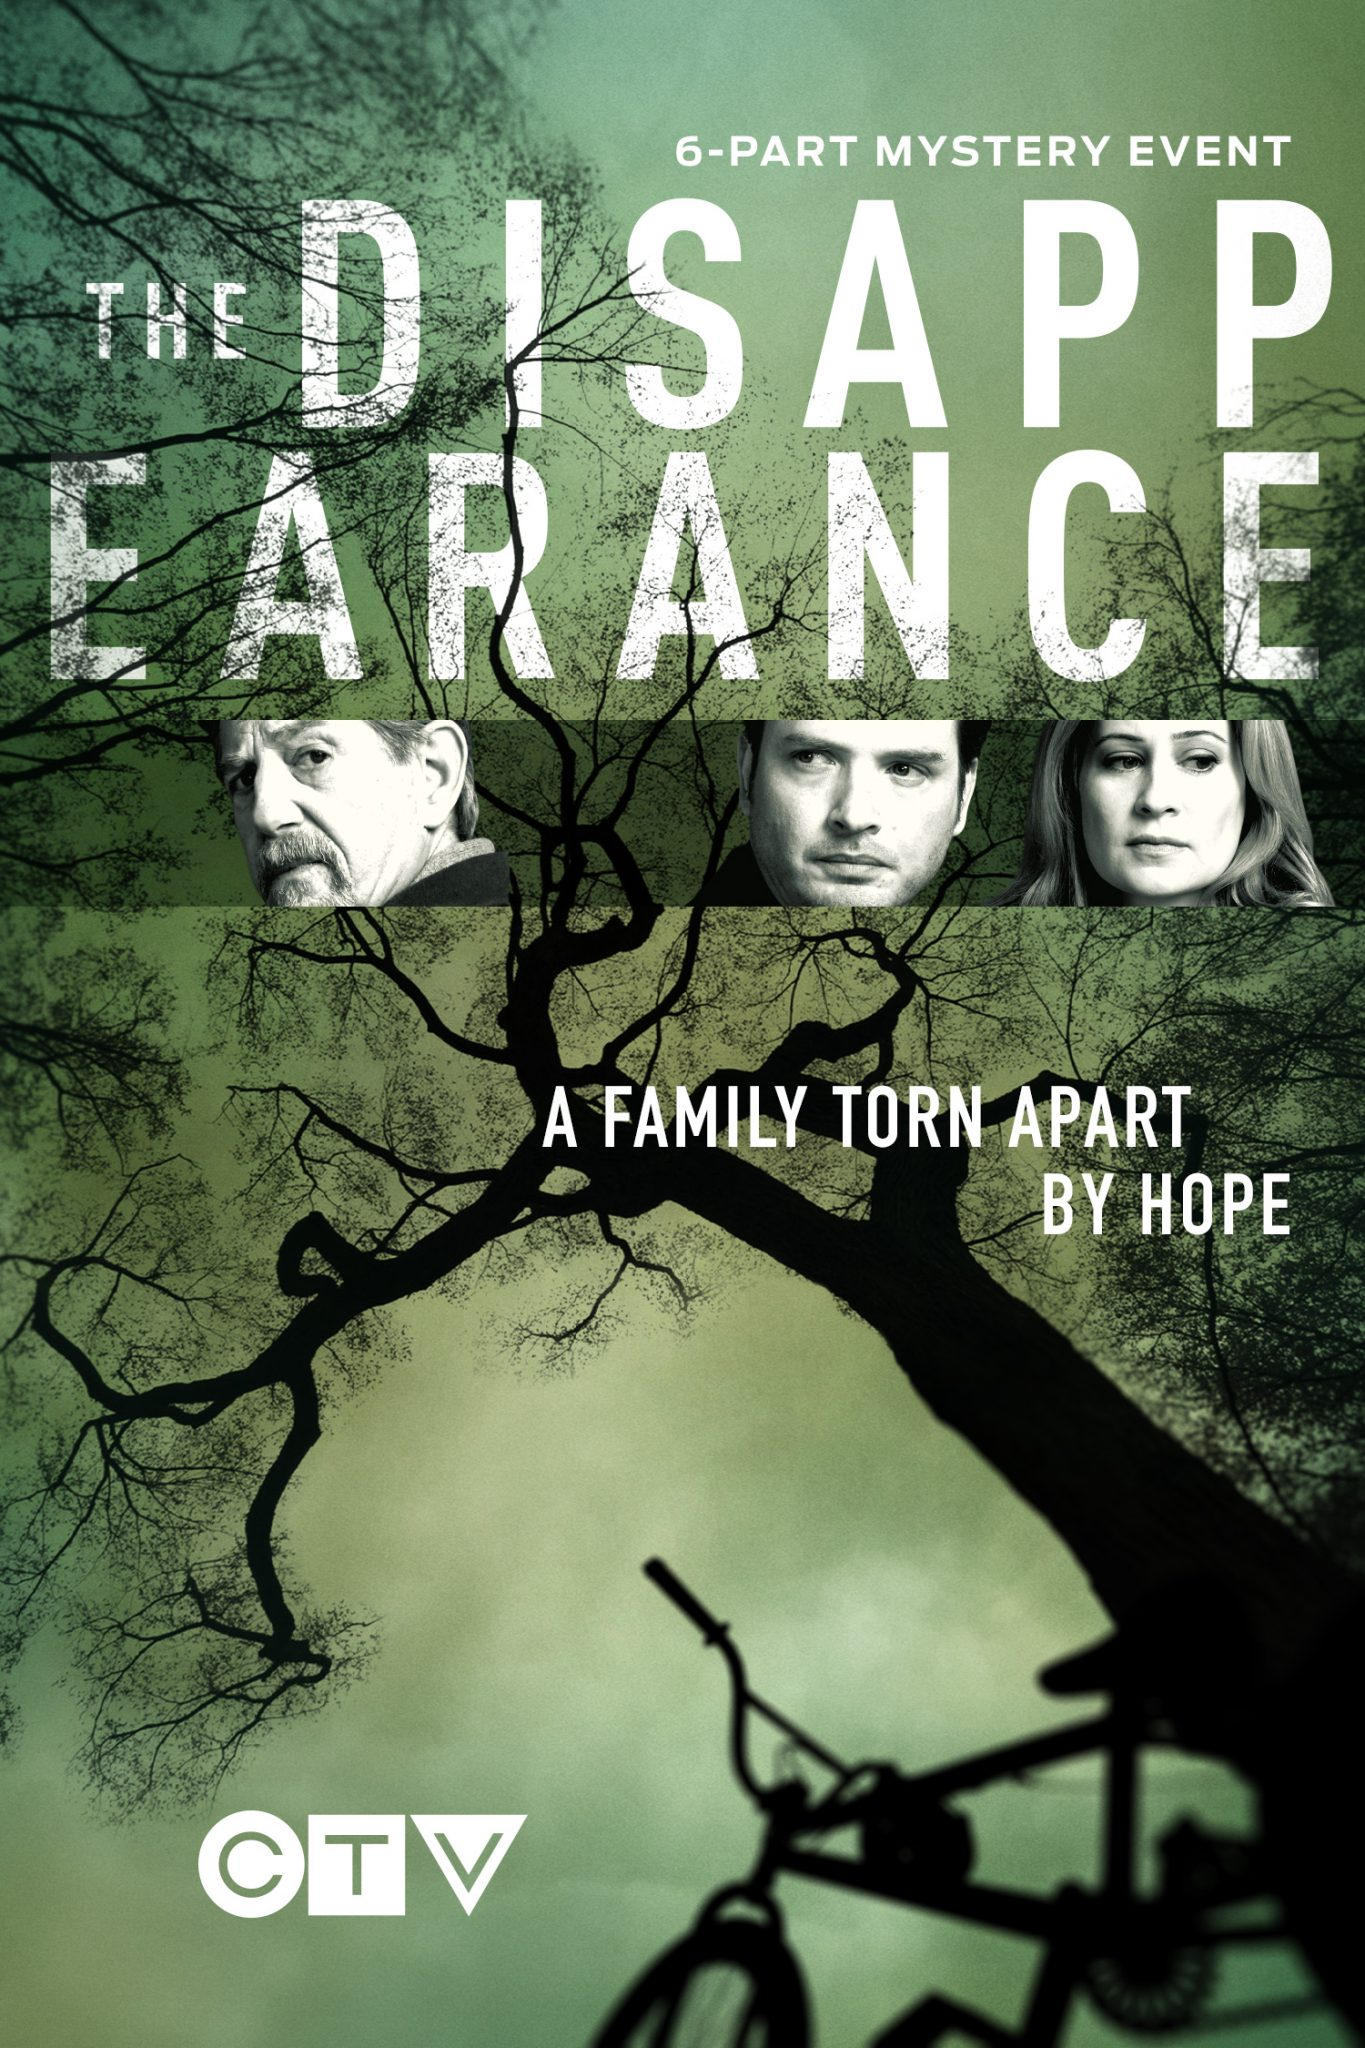 The Disappearance (TV Mini-Series 2017) - IMDb